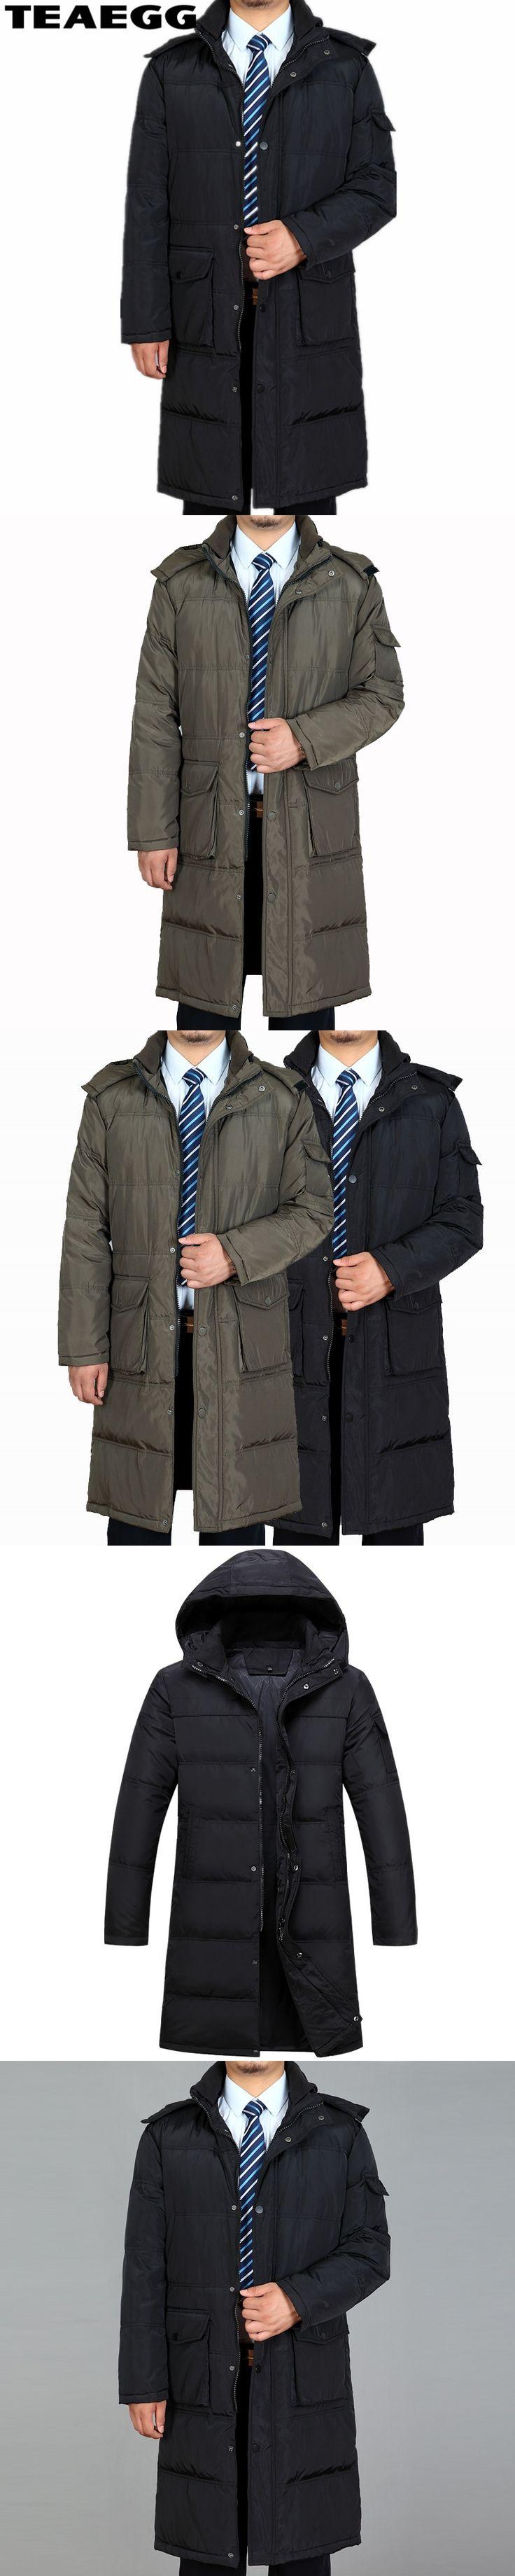 TEAEGG Plus Size 4XL Black Long Winter Duck Down Jacket Men Clothing Hooded White Duck Down Jacket For Men Parka Hombre AL268